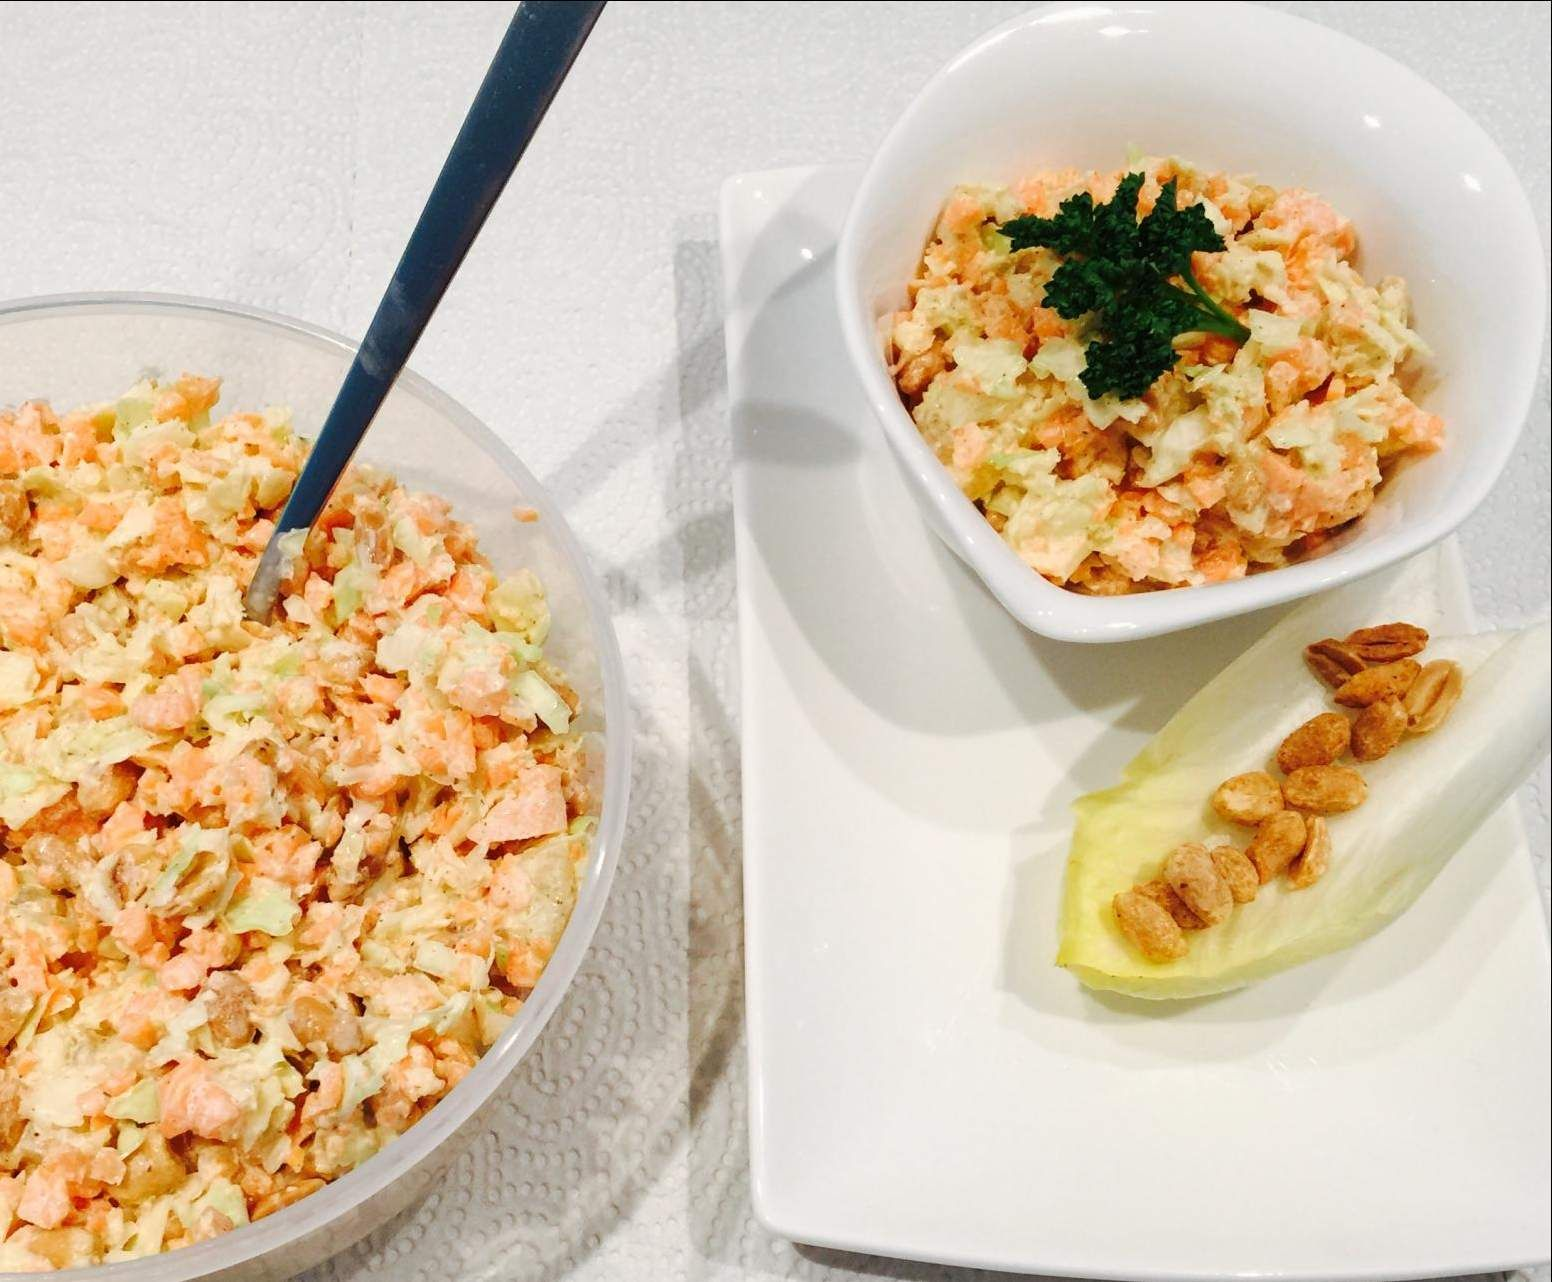 ananas karotten kohl salat mit erdn ssen rezept kochrezepte pinterest kohl salat. Black Bedroom Furniture Sets. Home Design Ideas